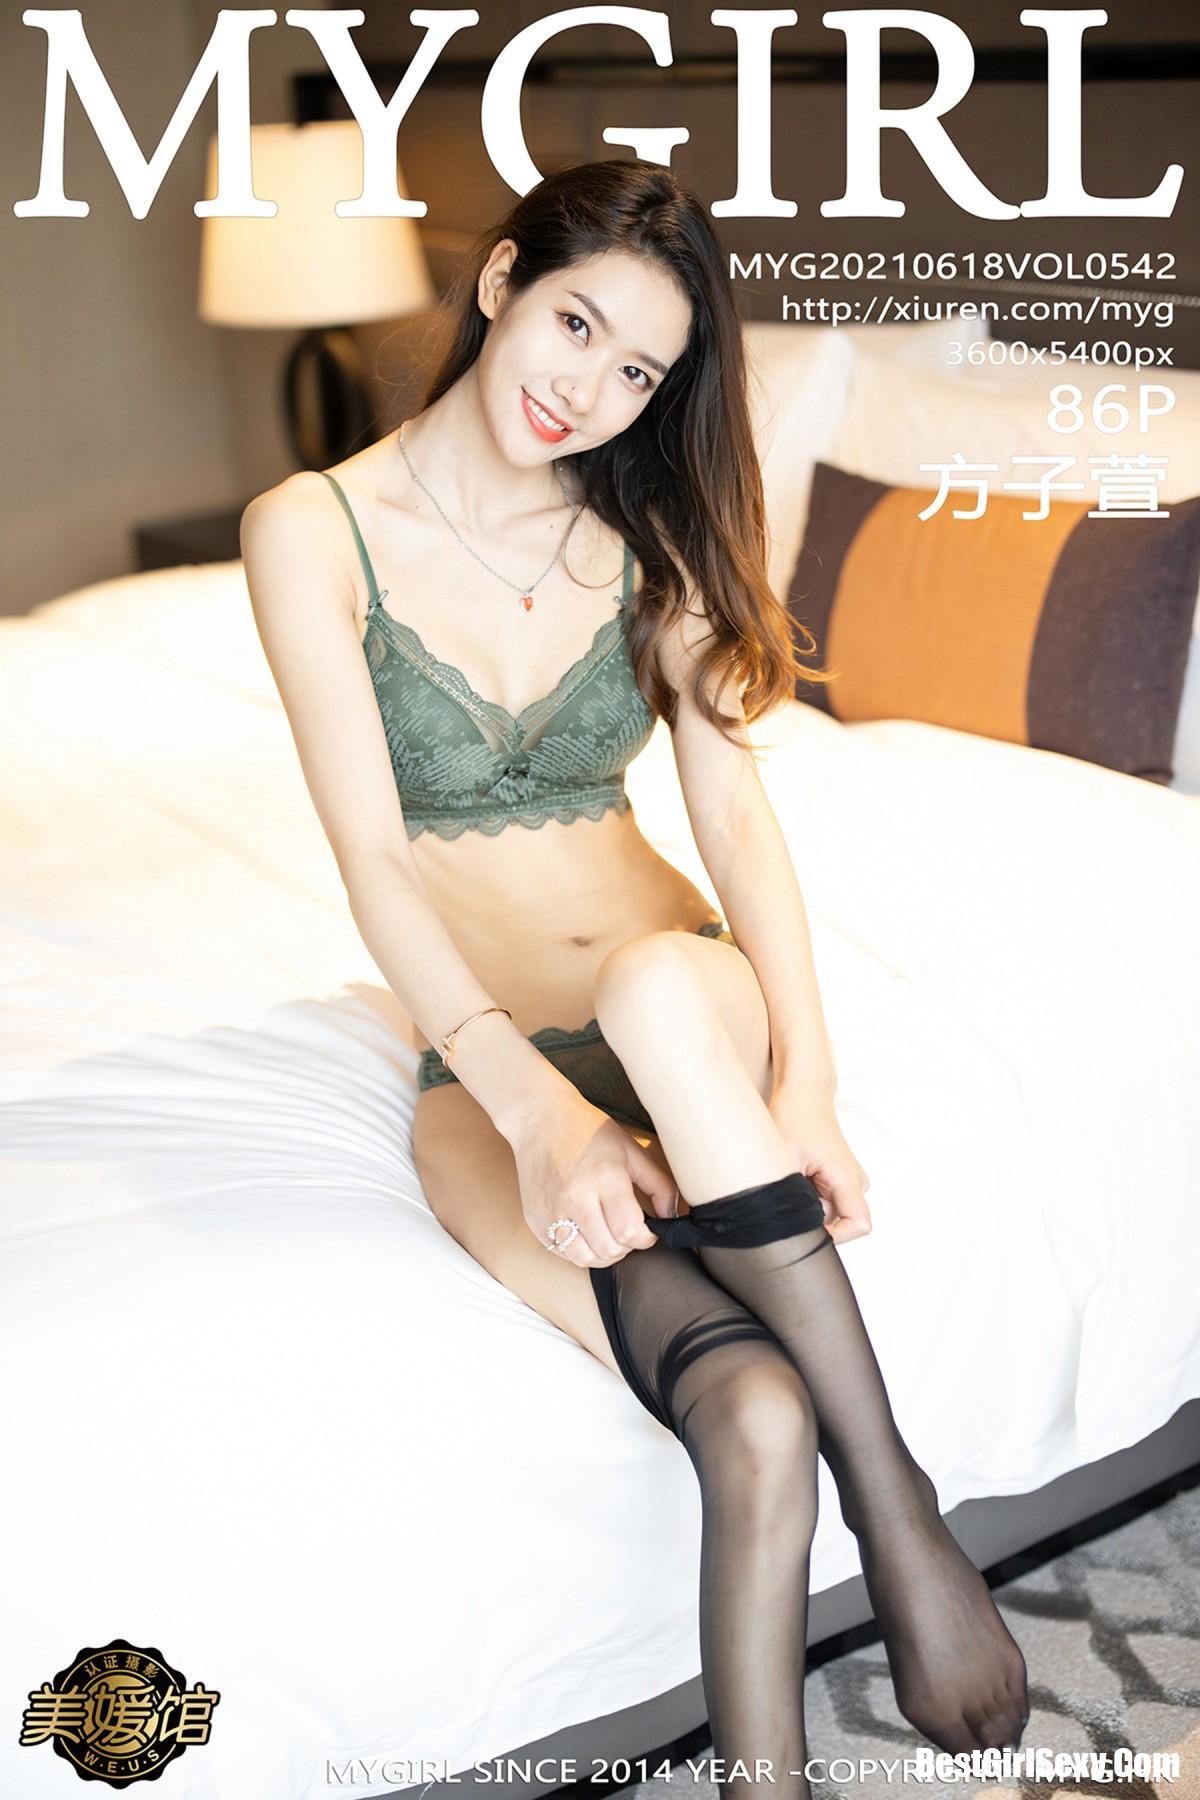 MyGirl美媛馆 Vol.542 Mu Qing 448